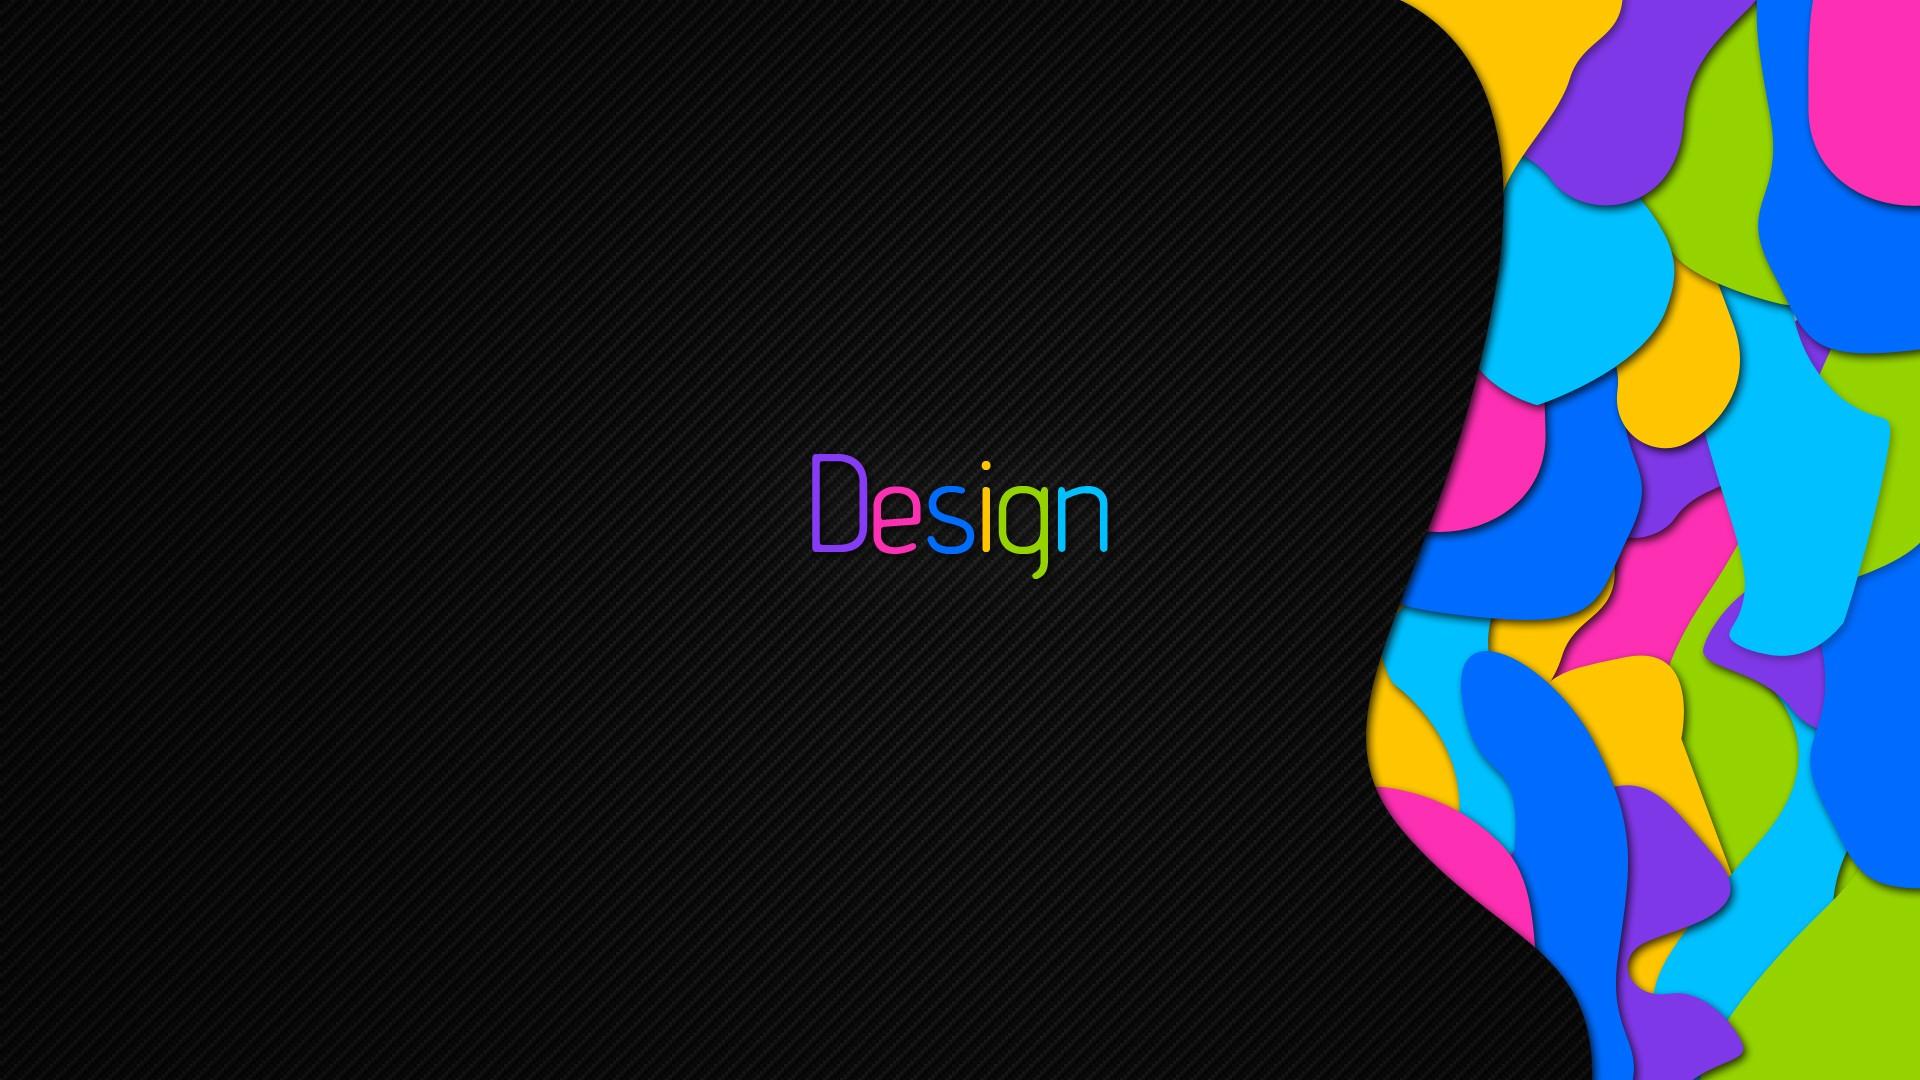 Wallpaper Colors Design Designs Images 1920x1080